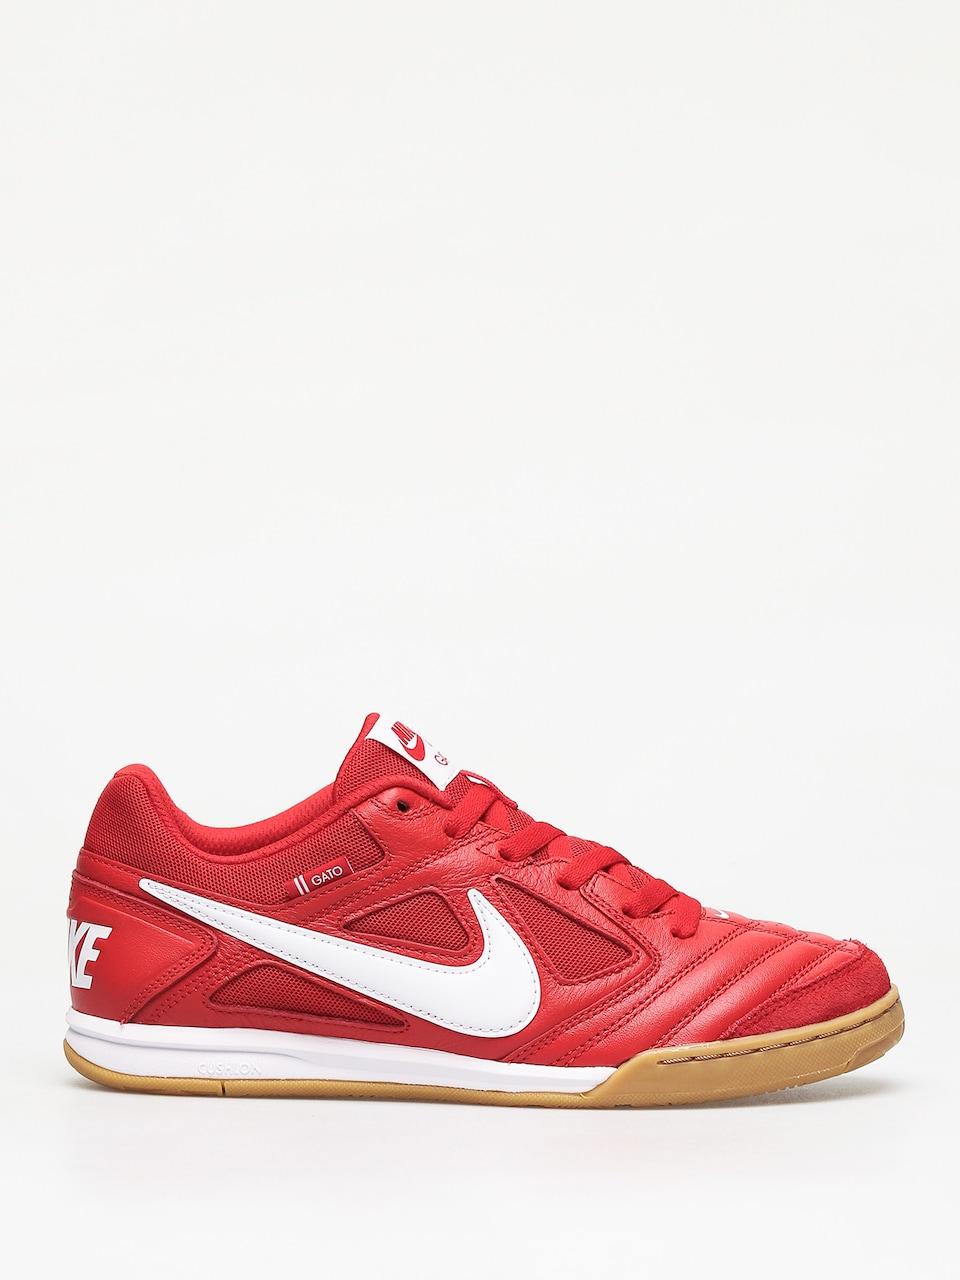 Genealogía Cálculo término análogo  Nike SB Sb Gato Shoes (university red/white gum light brown)